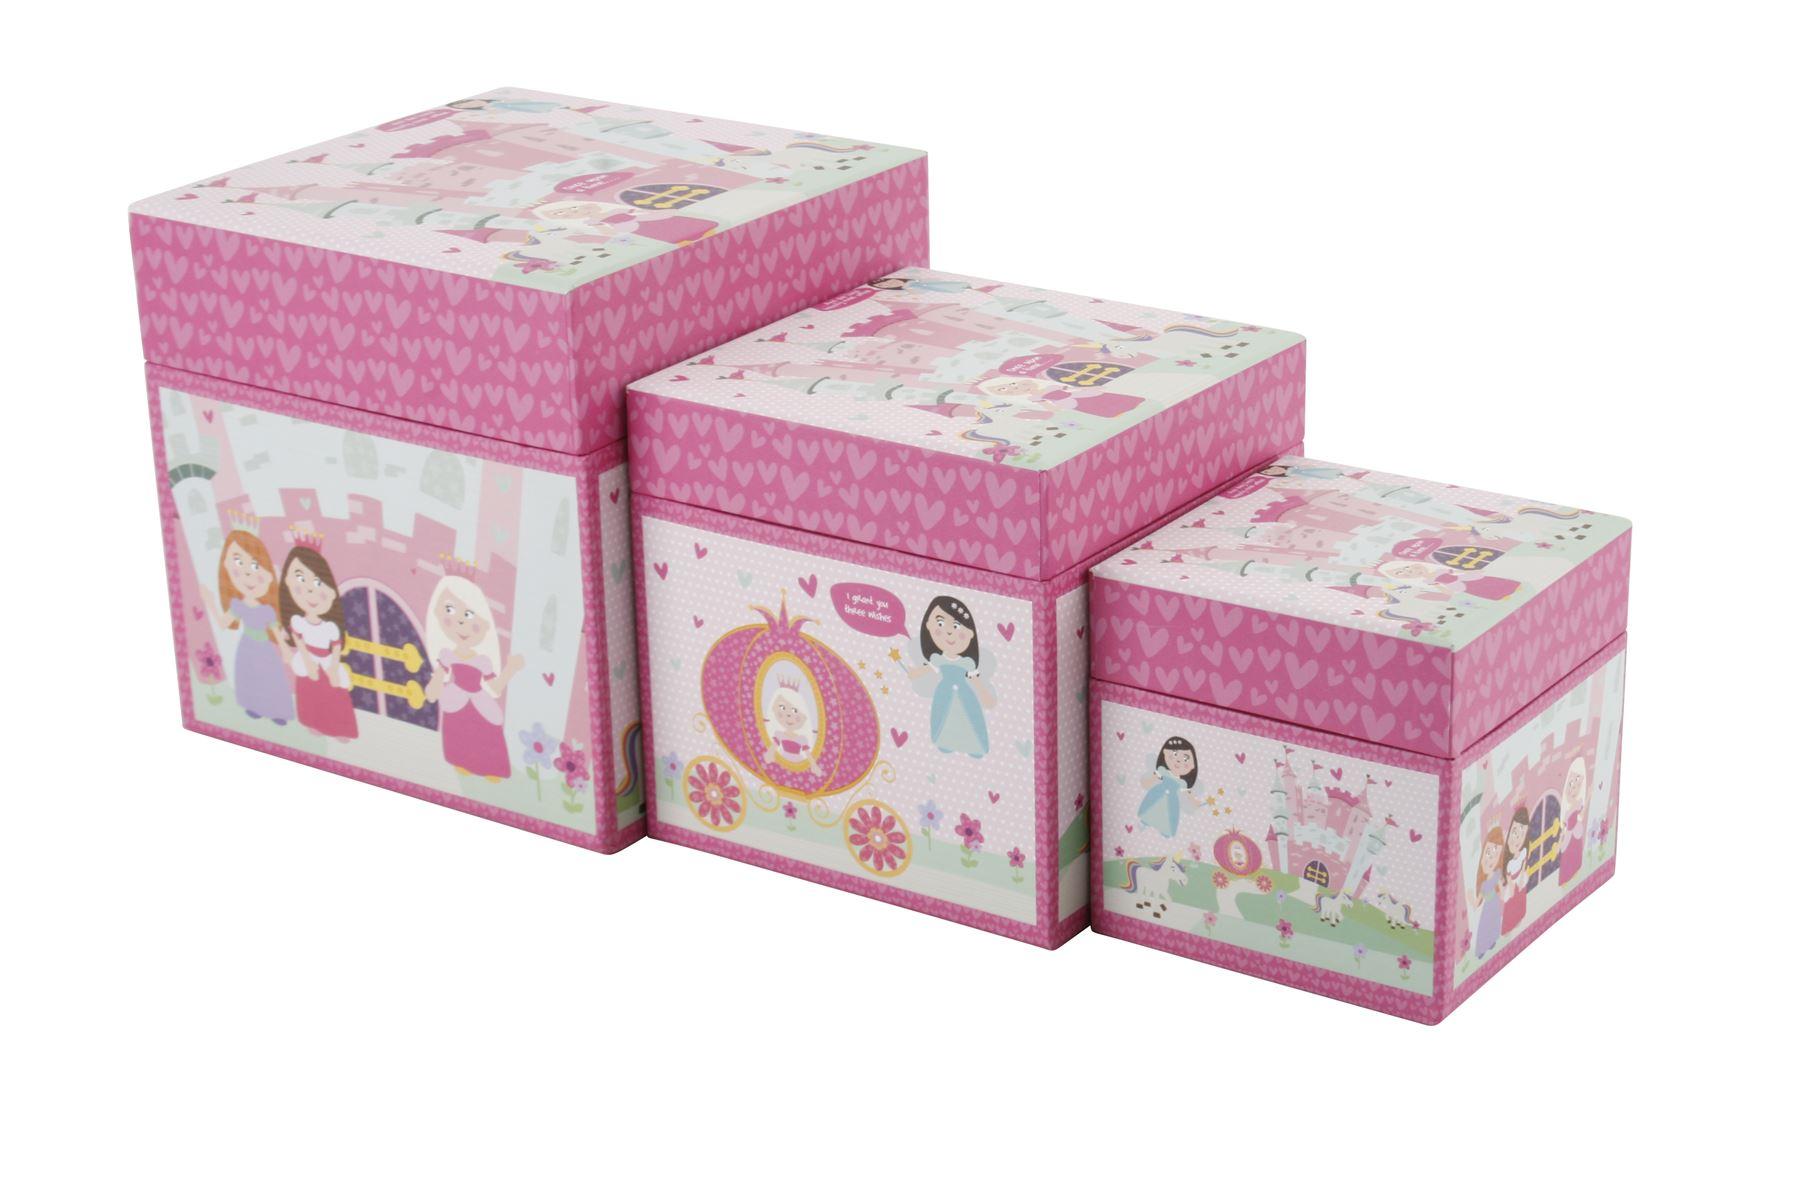 Kids Storage Cube Organizer Toy Box Kids Bedroom Furniture: SET 3 X GIRLS PRINCESS STORAGE BOXES Toy Kids Childrens